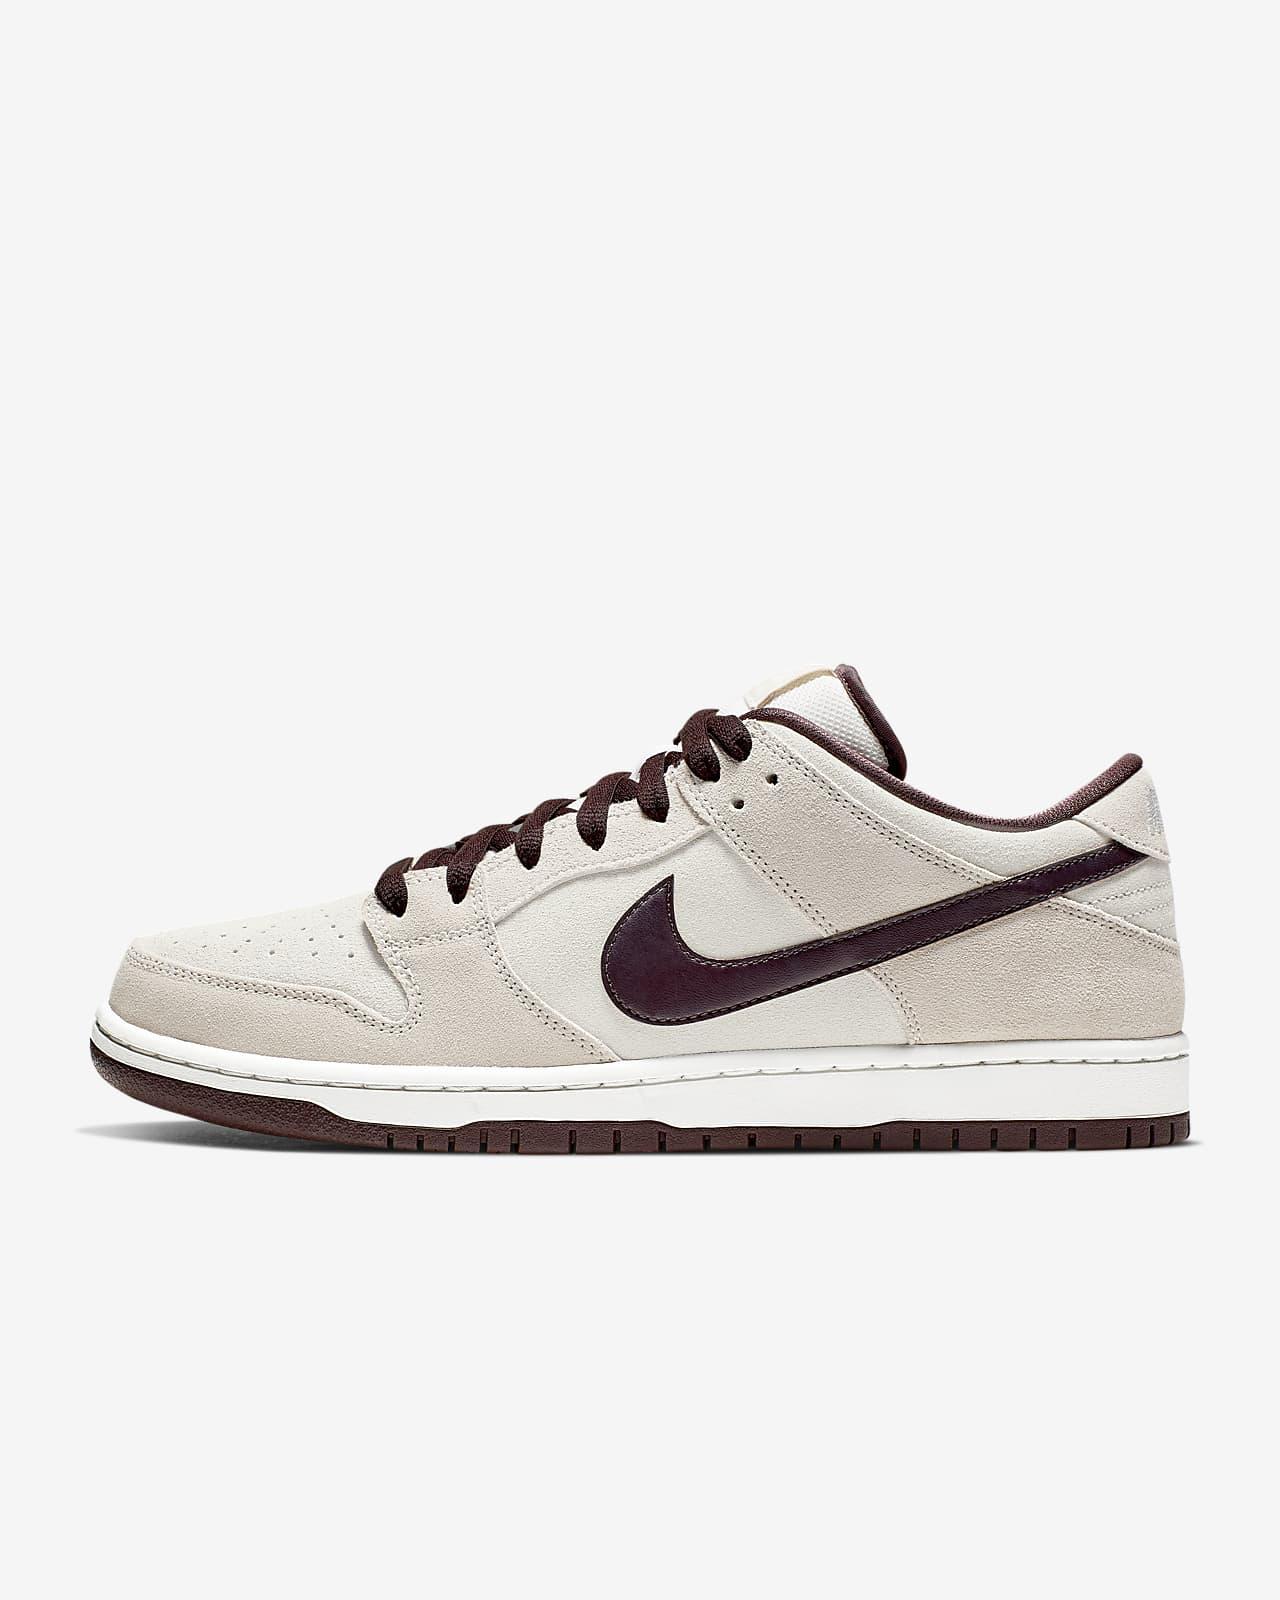 Pedir prestado pizarra comprar  Nike SB Dunk Low Pro Skate Shoe. Nike RO